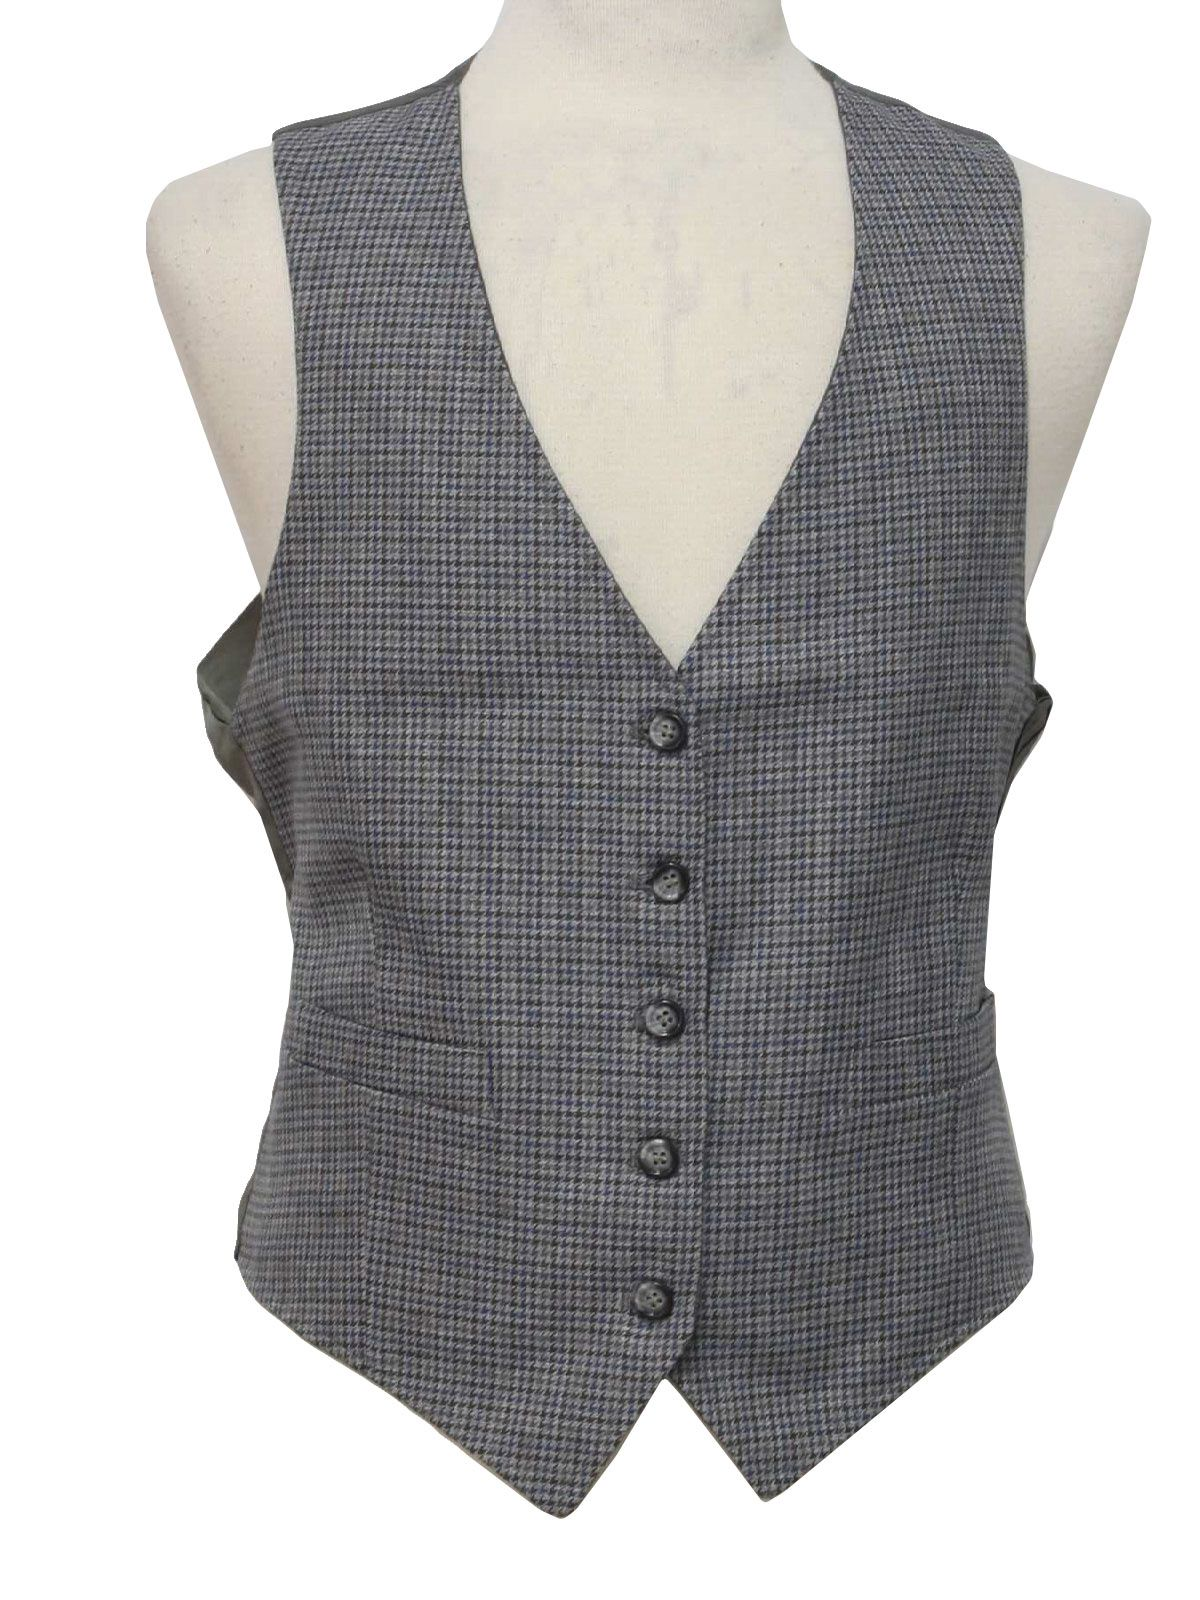 women vest patterns | Label- Mens grey, navy blue and dark brown ...